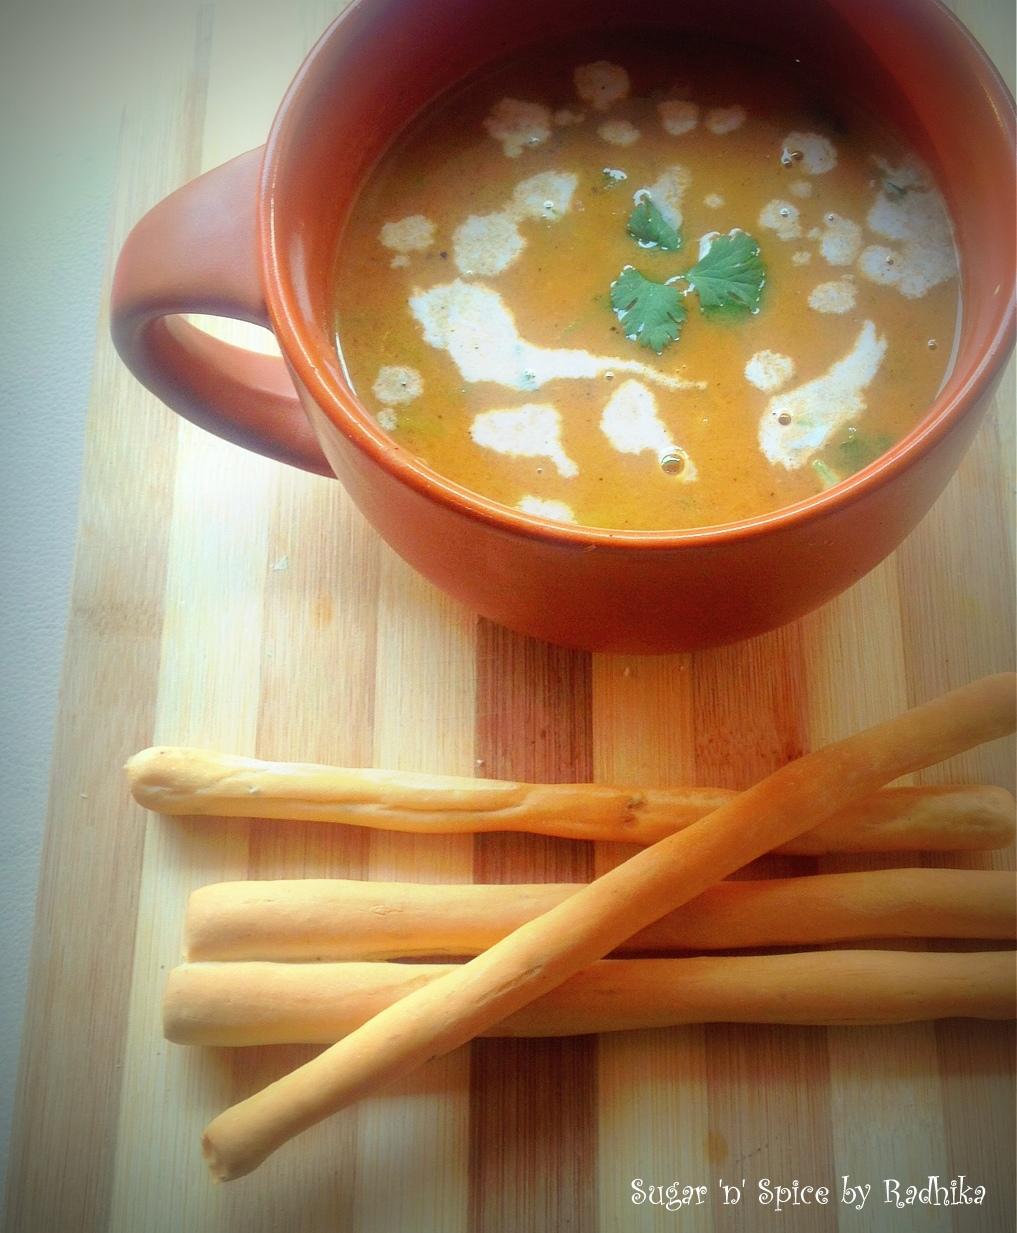 sugar n spice by radhika